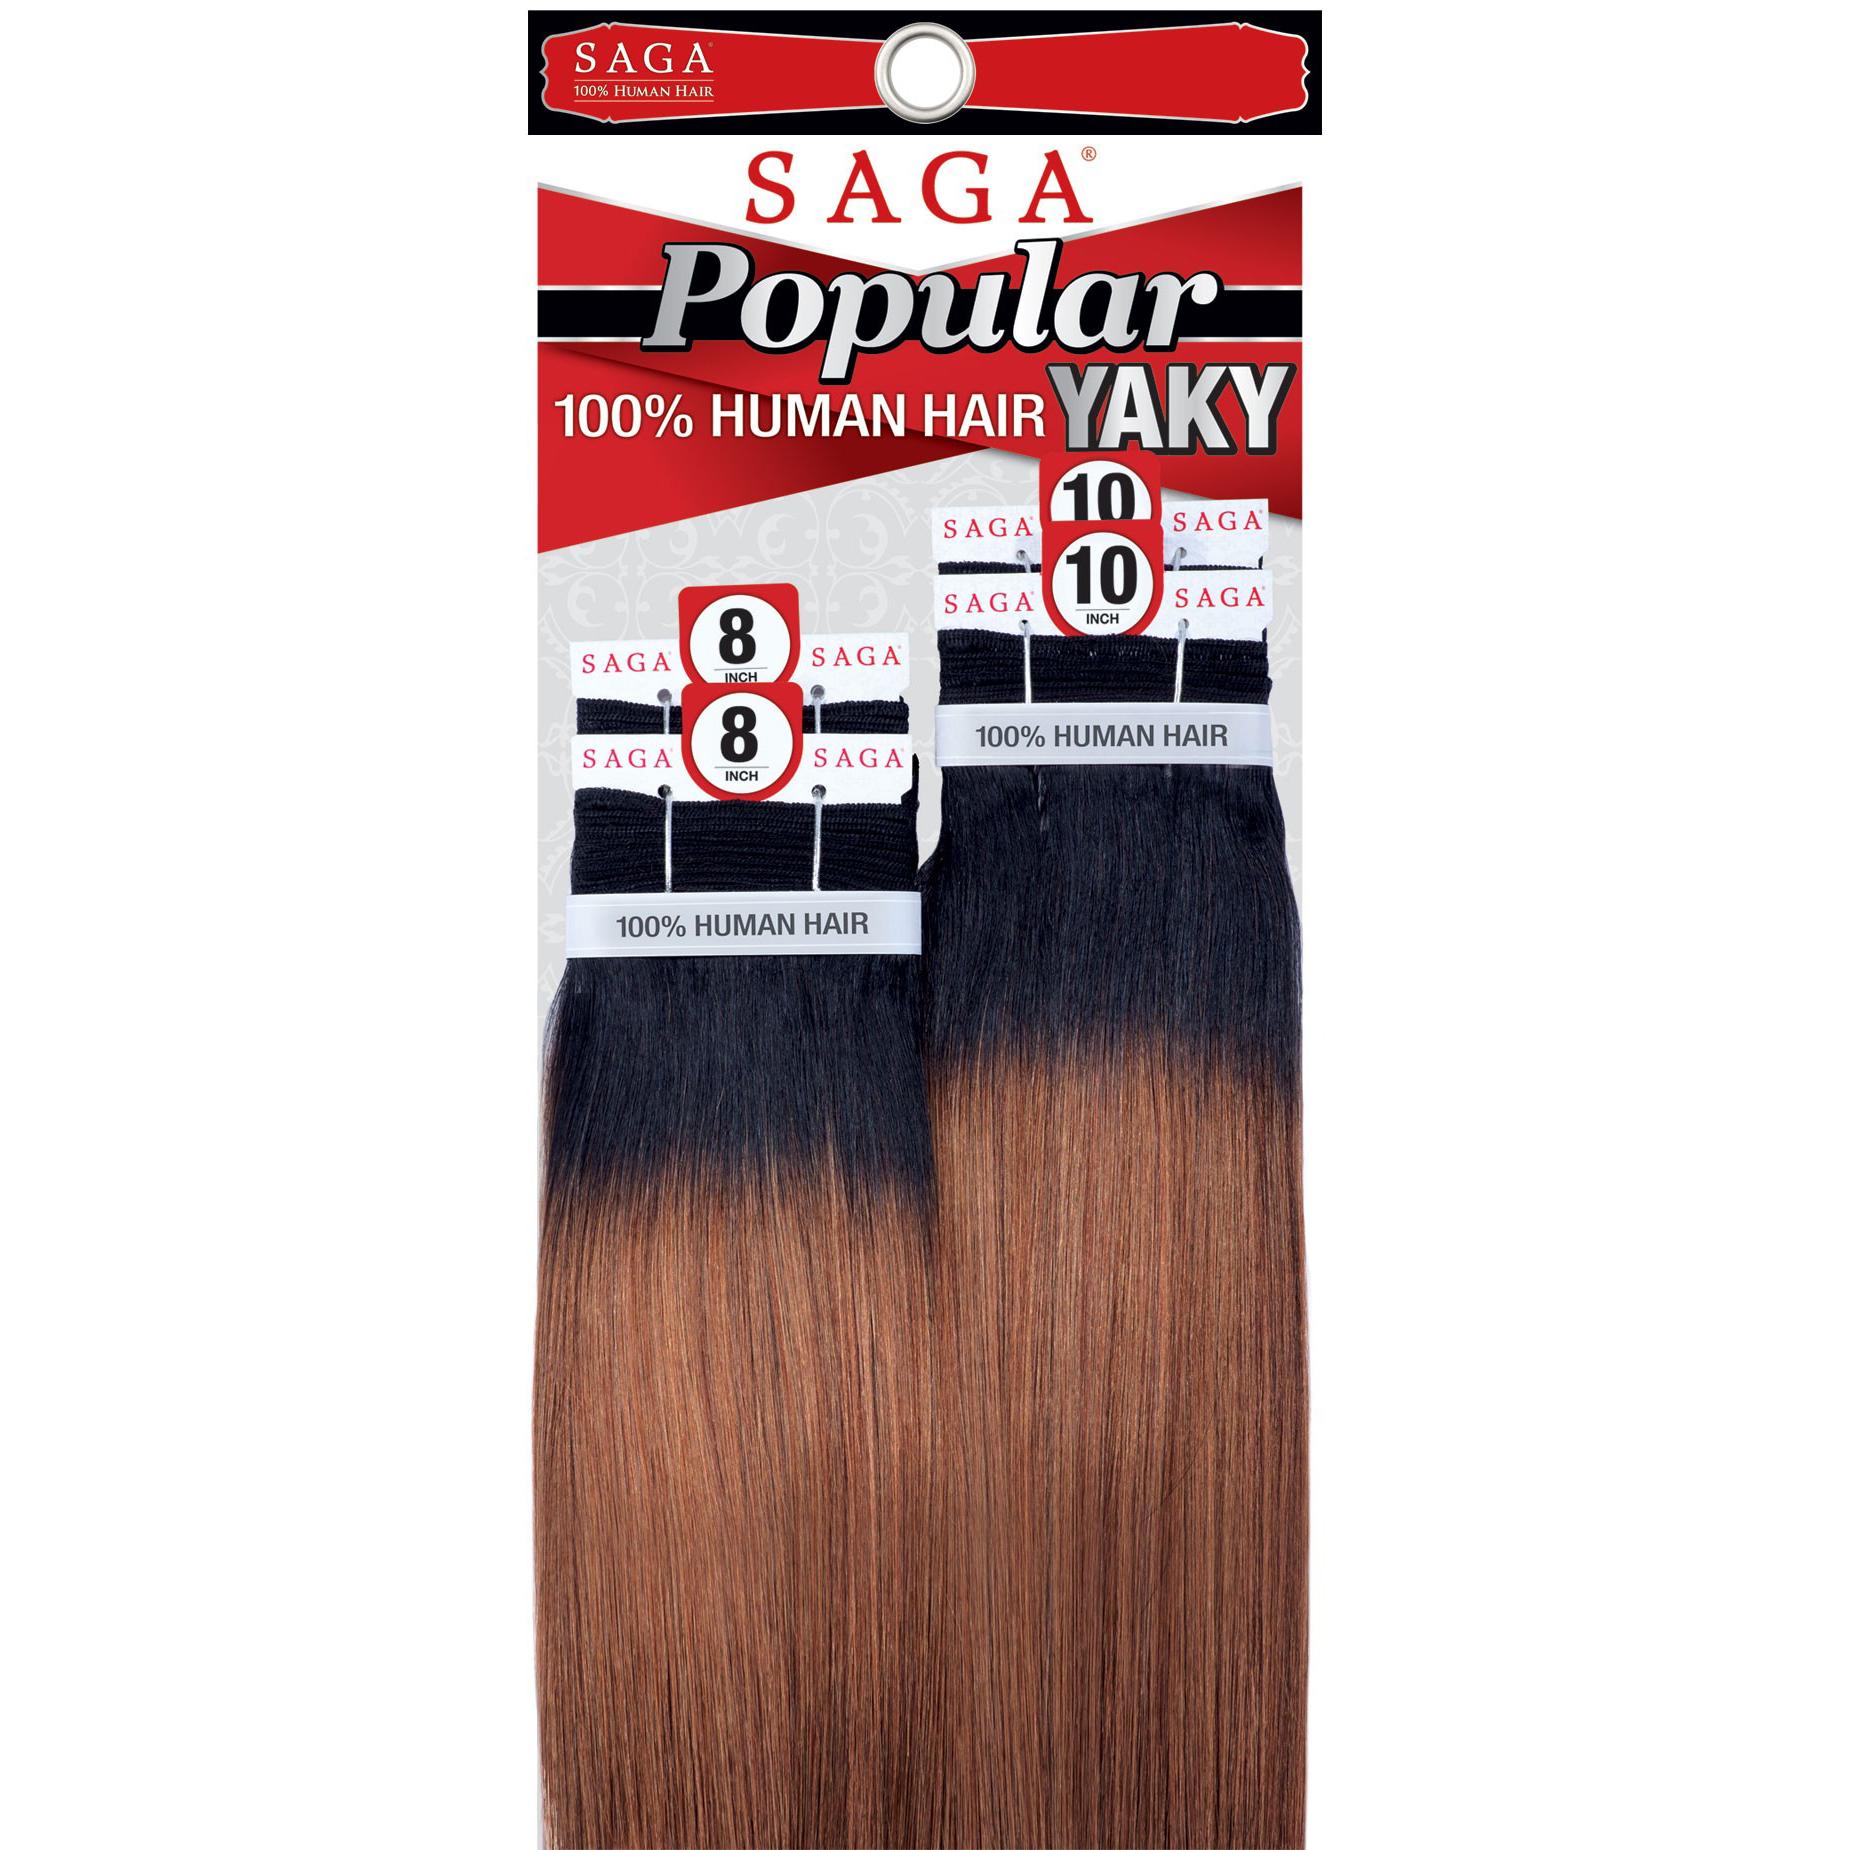 Popular yaky 4pcs saga 100 human hair yaky straight bundle popular yaky 4pcs saga 100 human hair yaky pmusecretfo Gallery